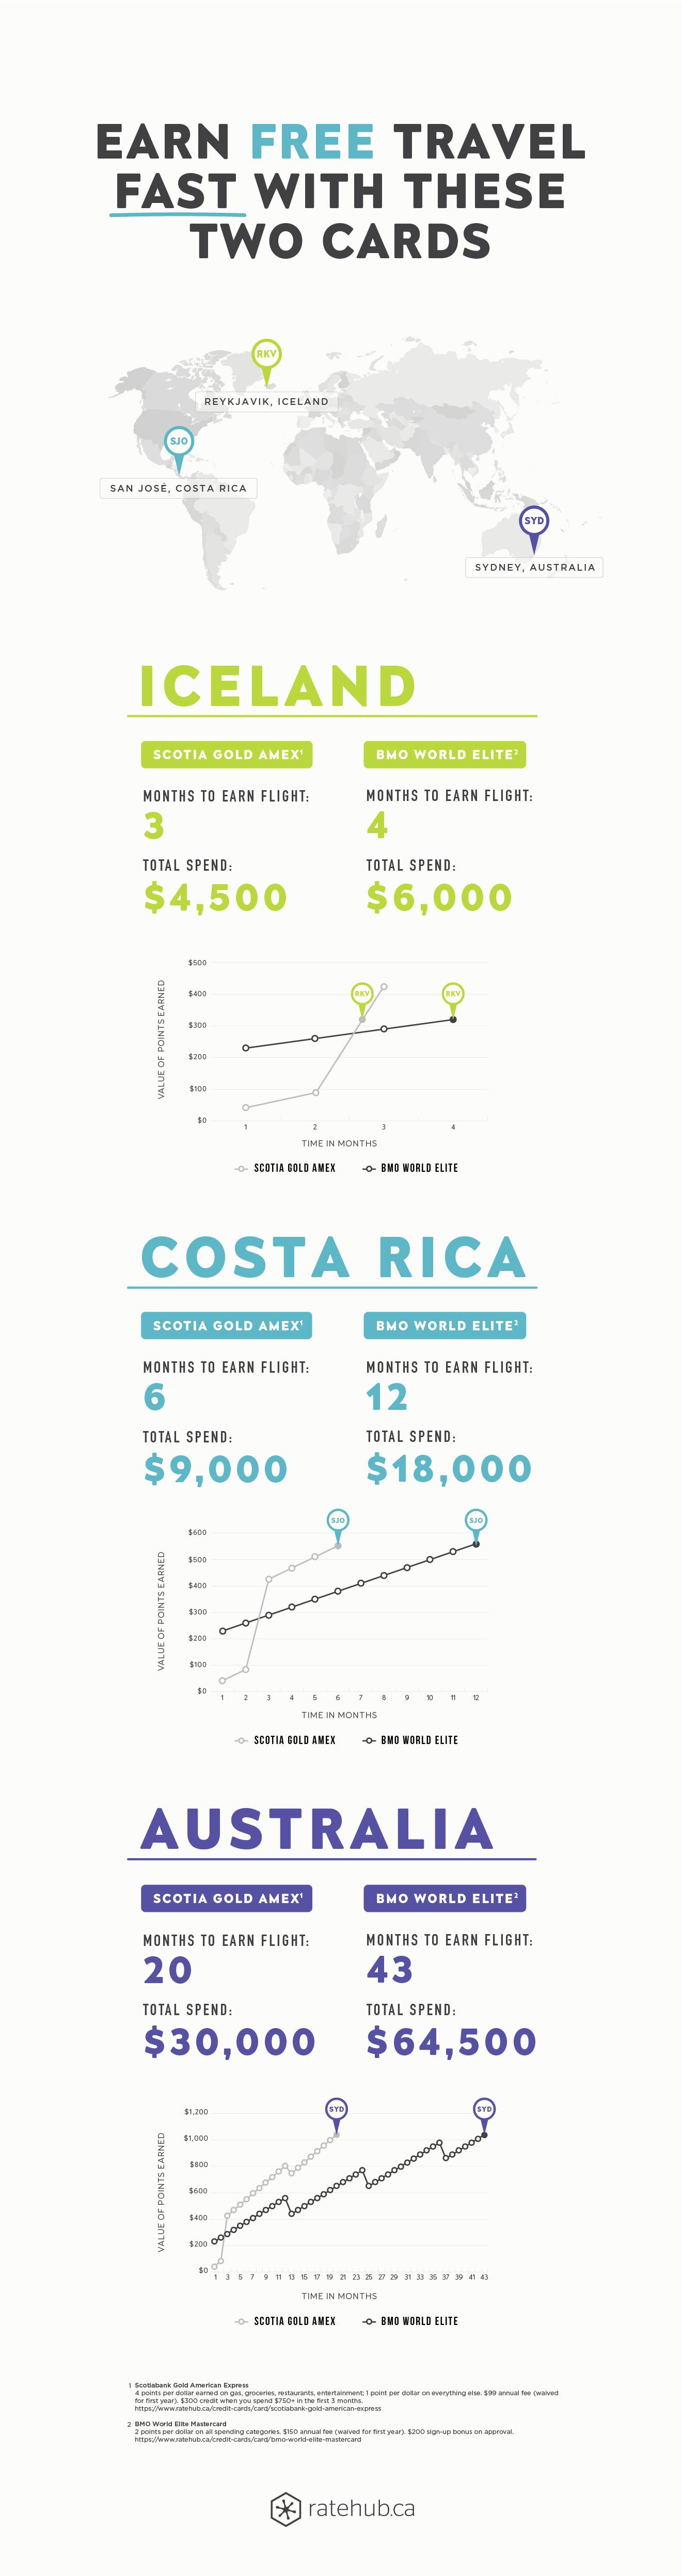 Travel Credit Cards Comparison - MoneySense